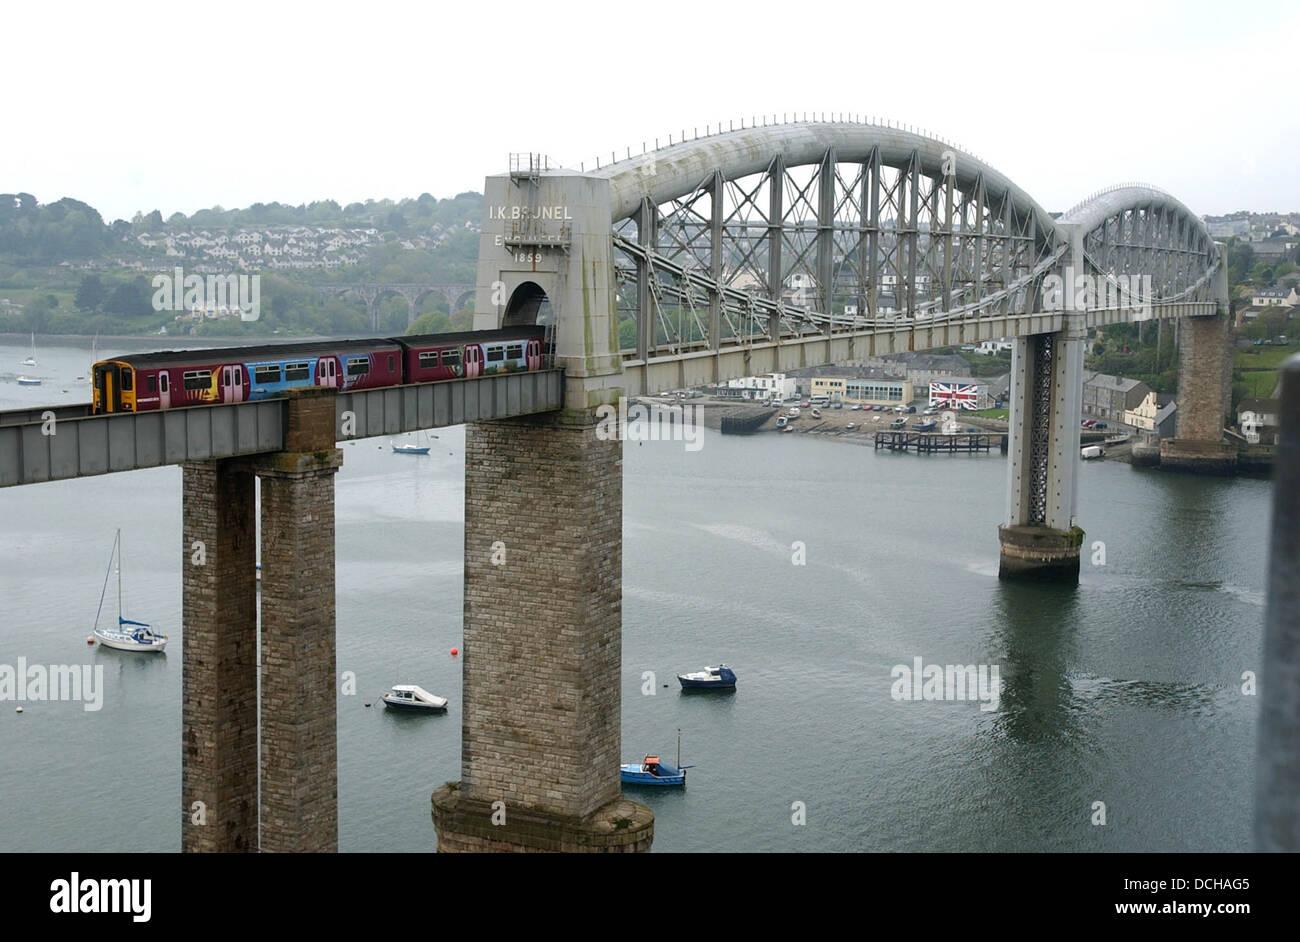 The Brunel Bidge joining Devon & Cornwall over the River Tamar . - Stock Image